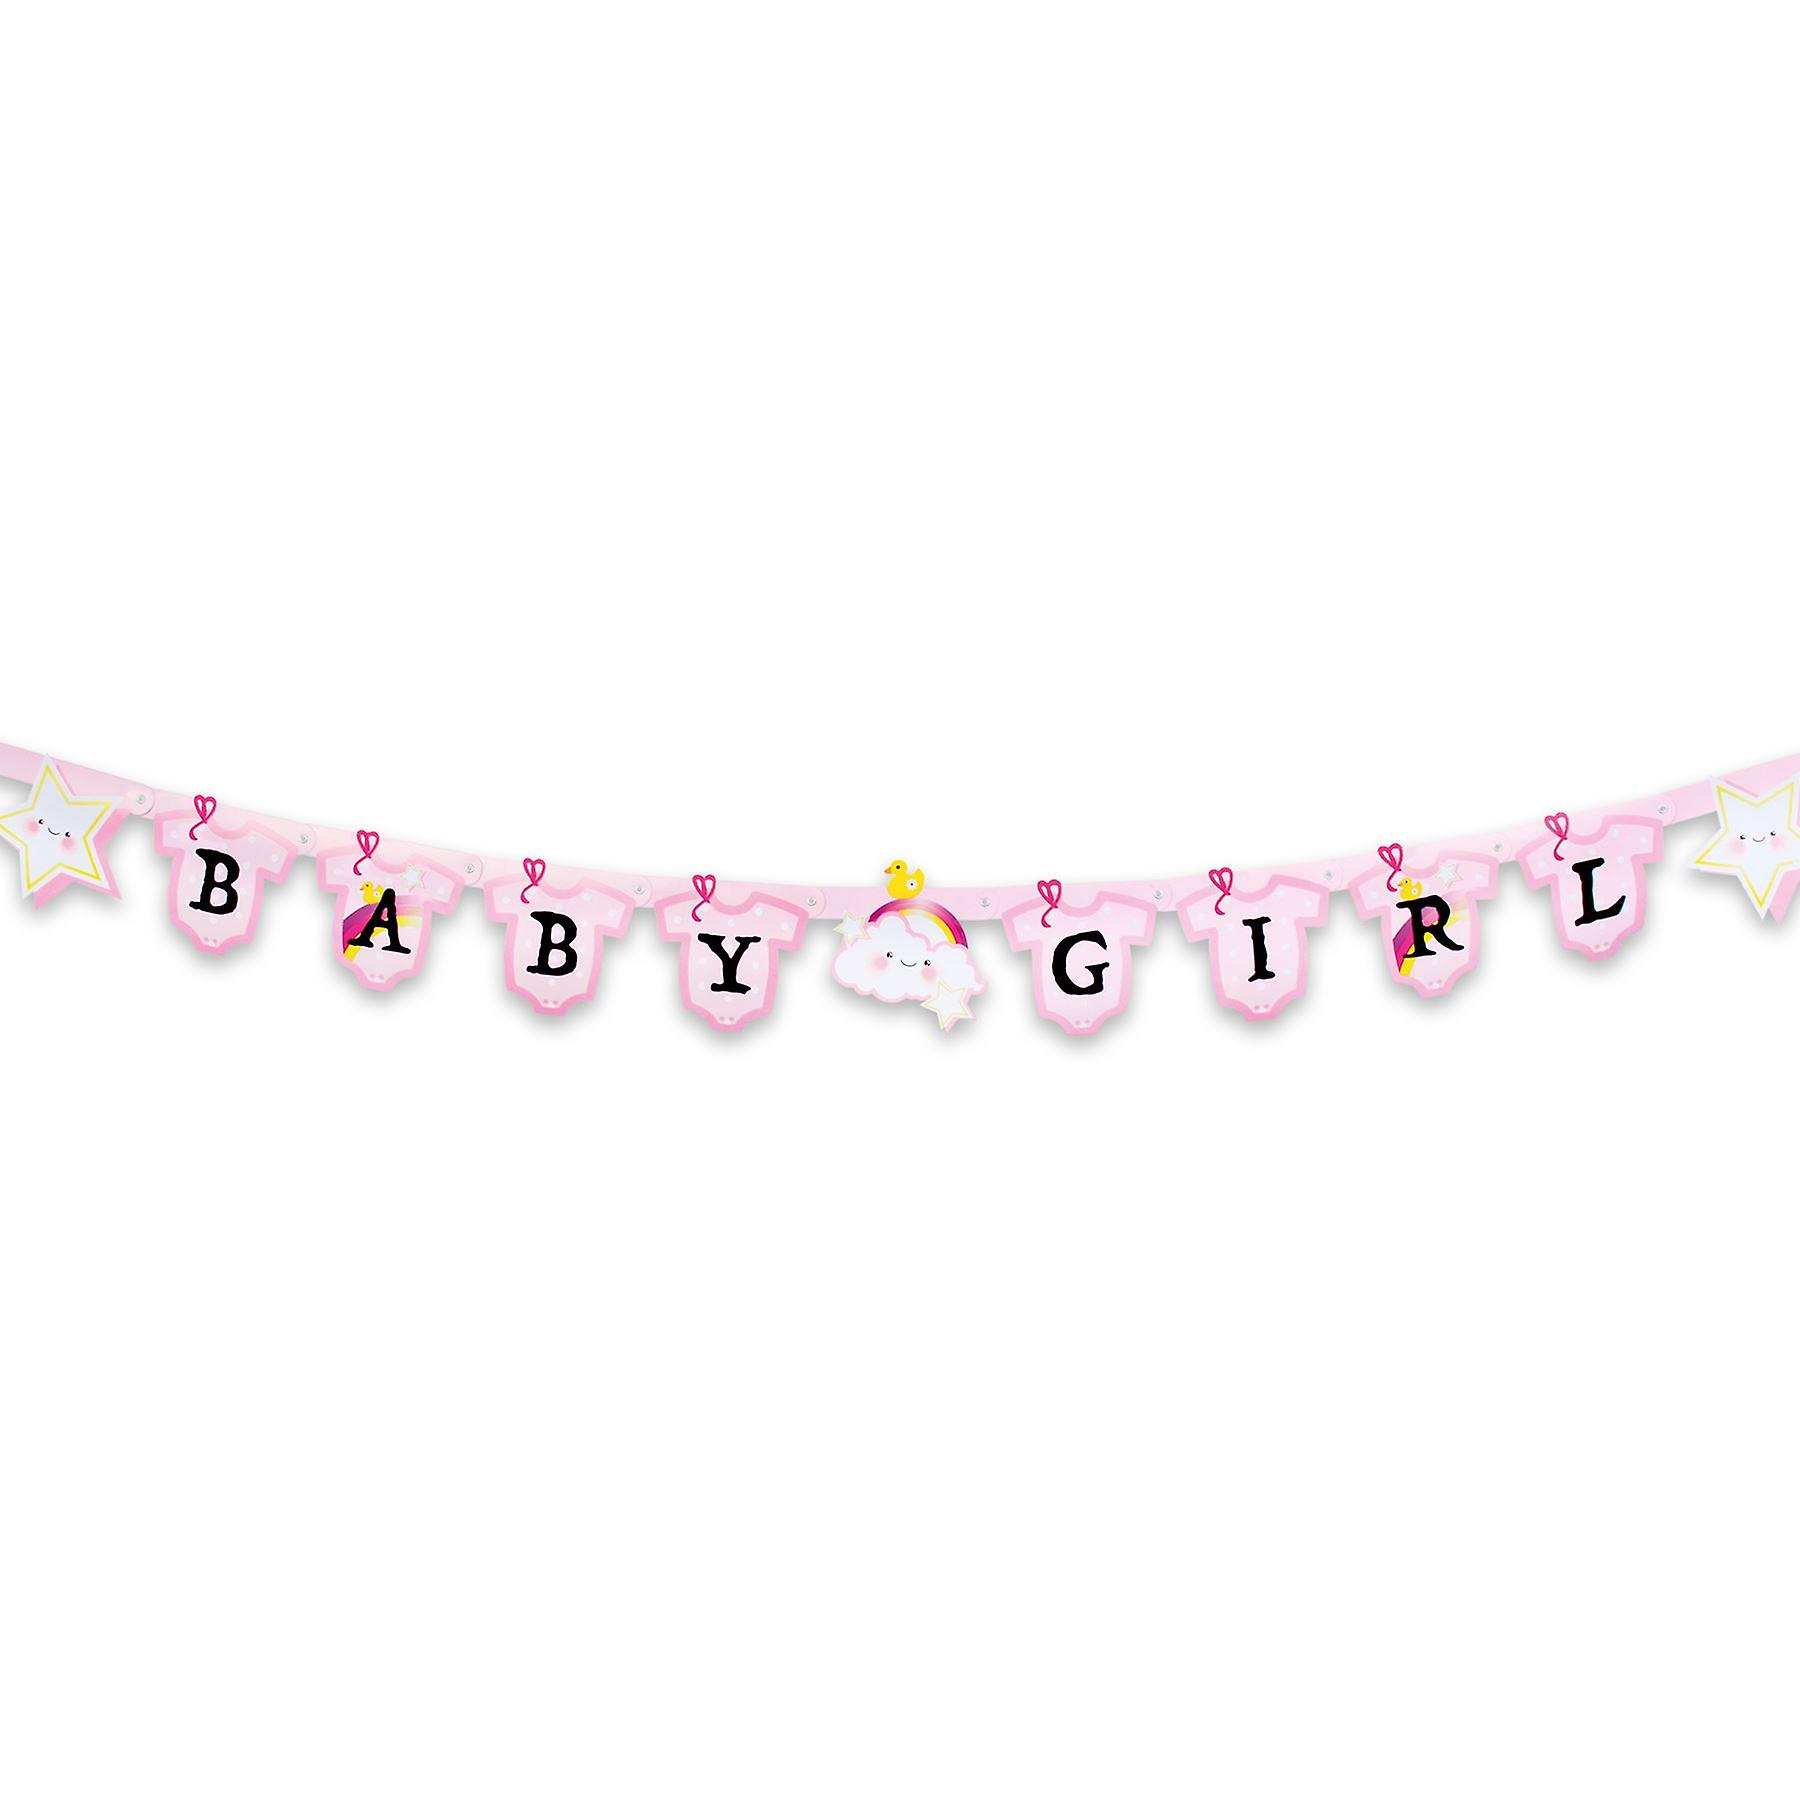 Baby Girl Banner 170cm Long New Birth Bunting